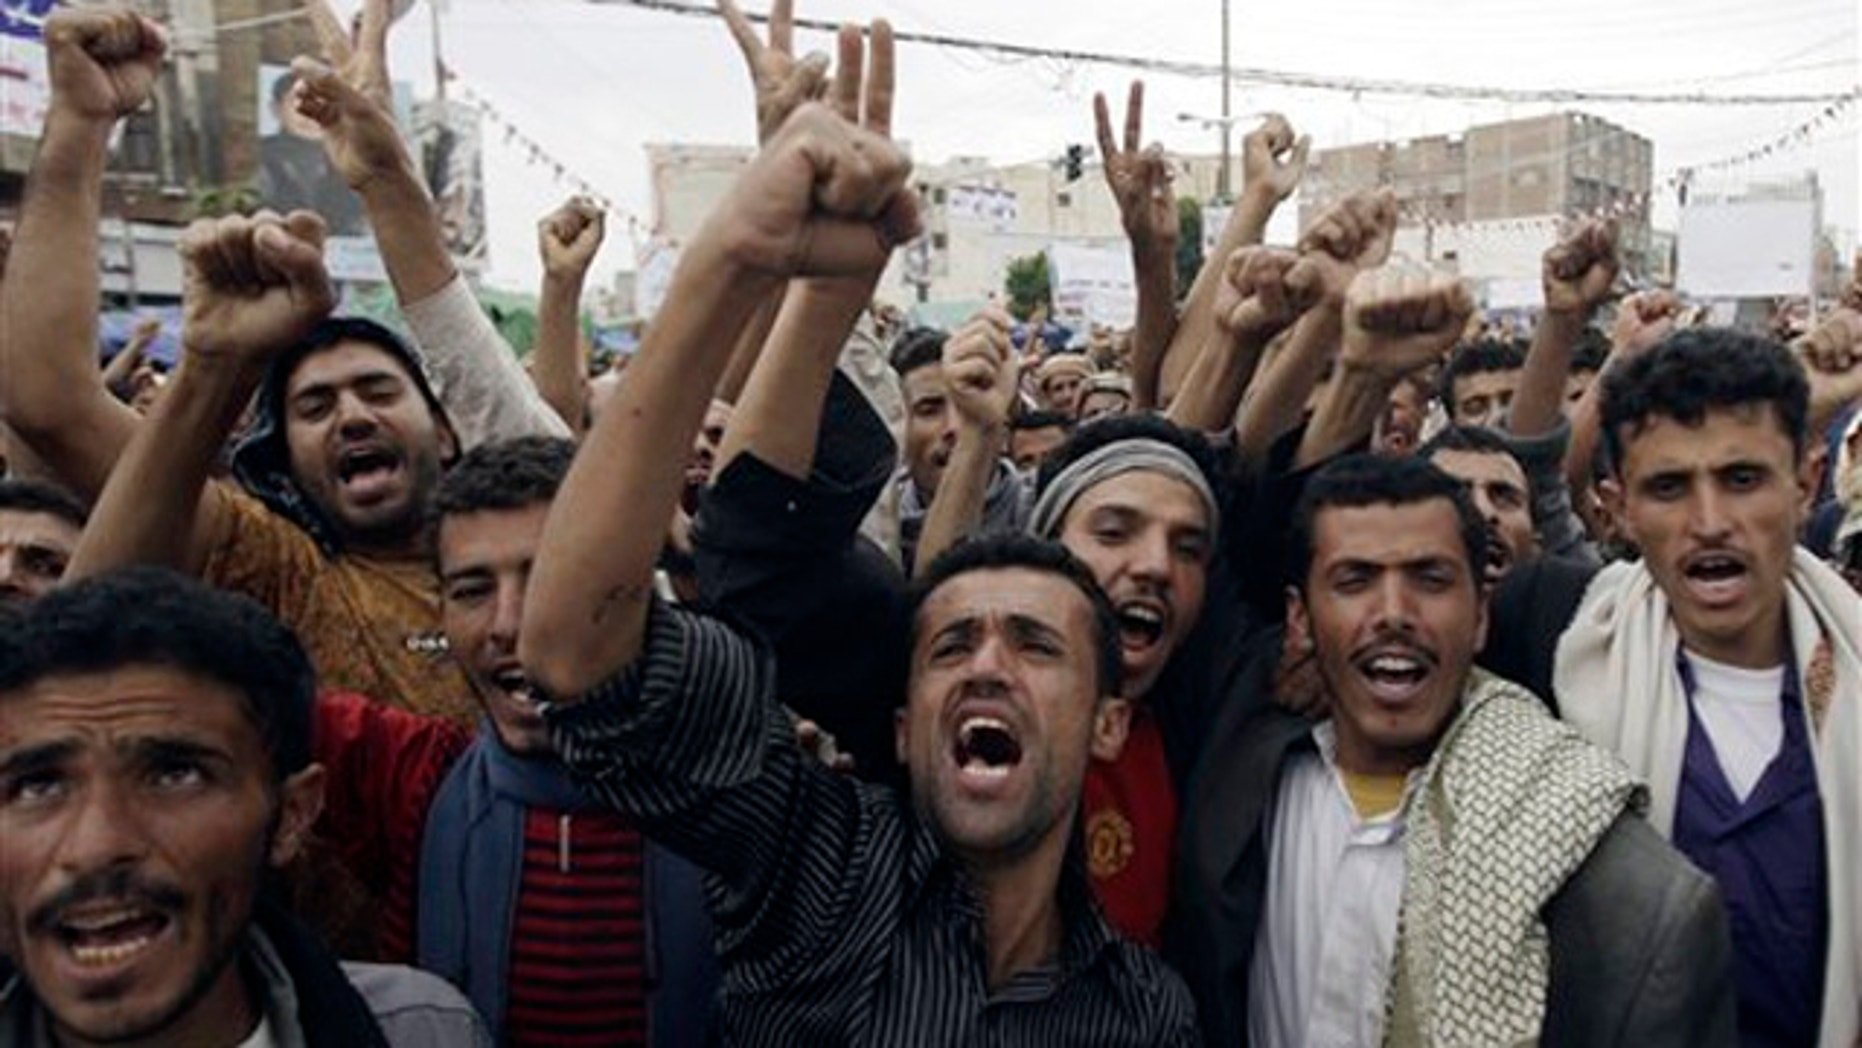 Yemeni protestors chant slogans during a demonstration demanding the resignation of Yemeni president Ali Abdullah Saleh in Sanaa, Yemen Wednesday, Sept. 14, 2011.